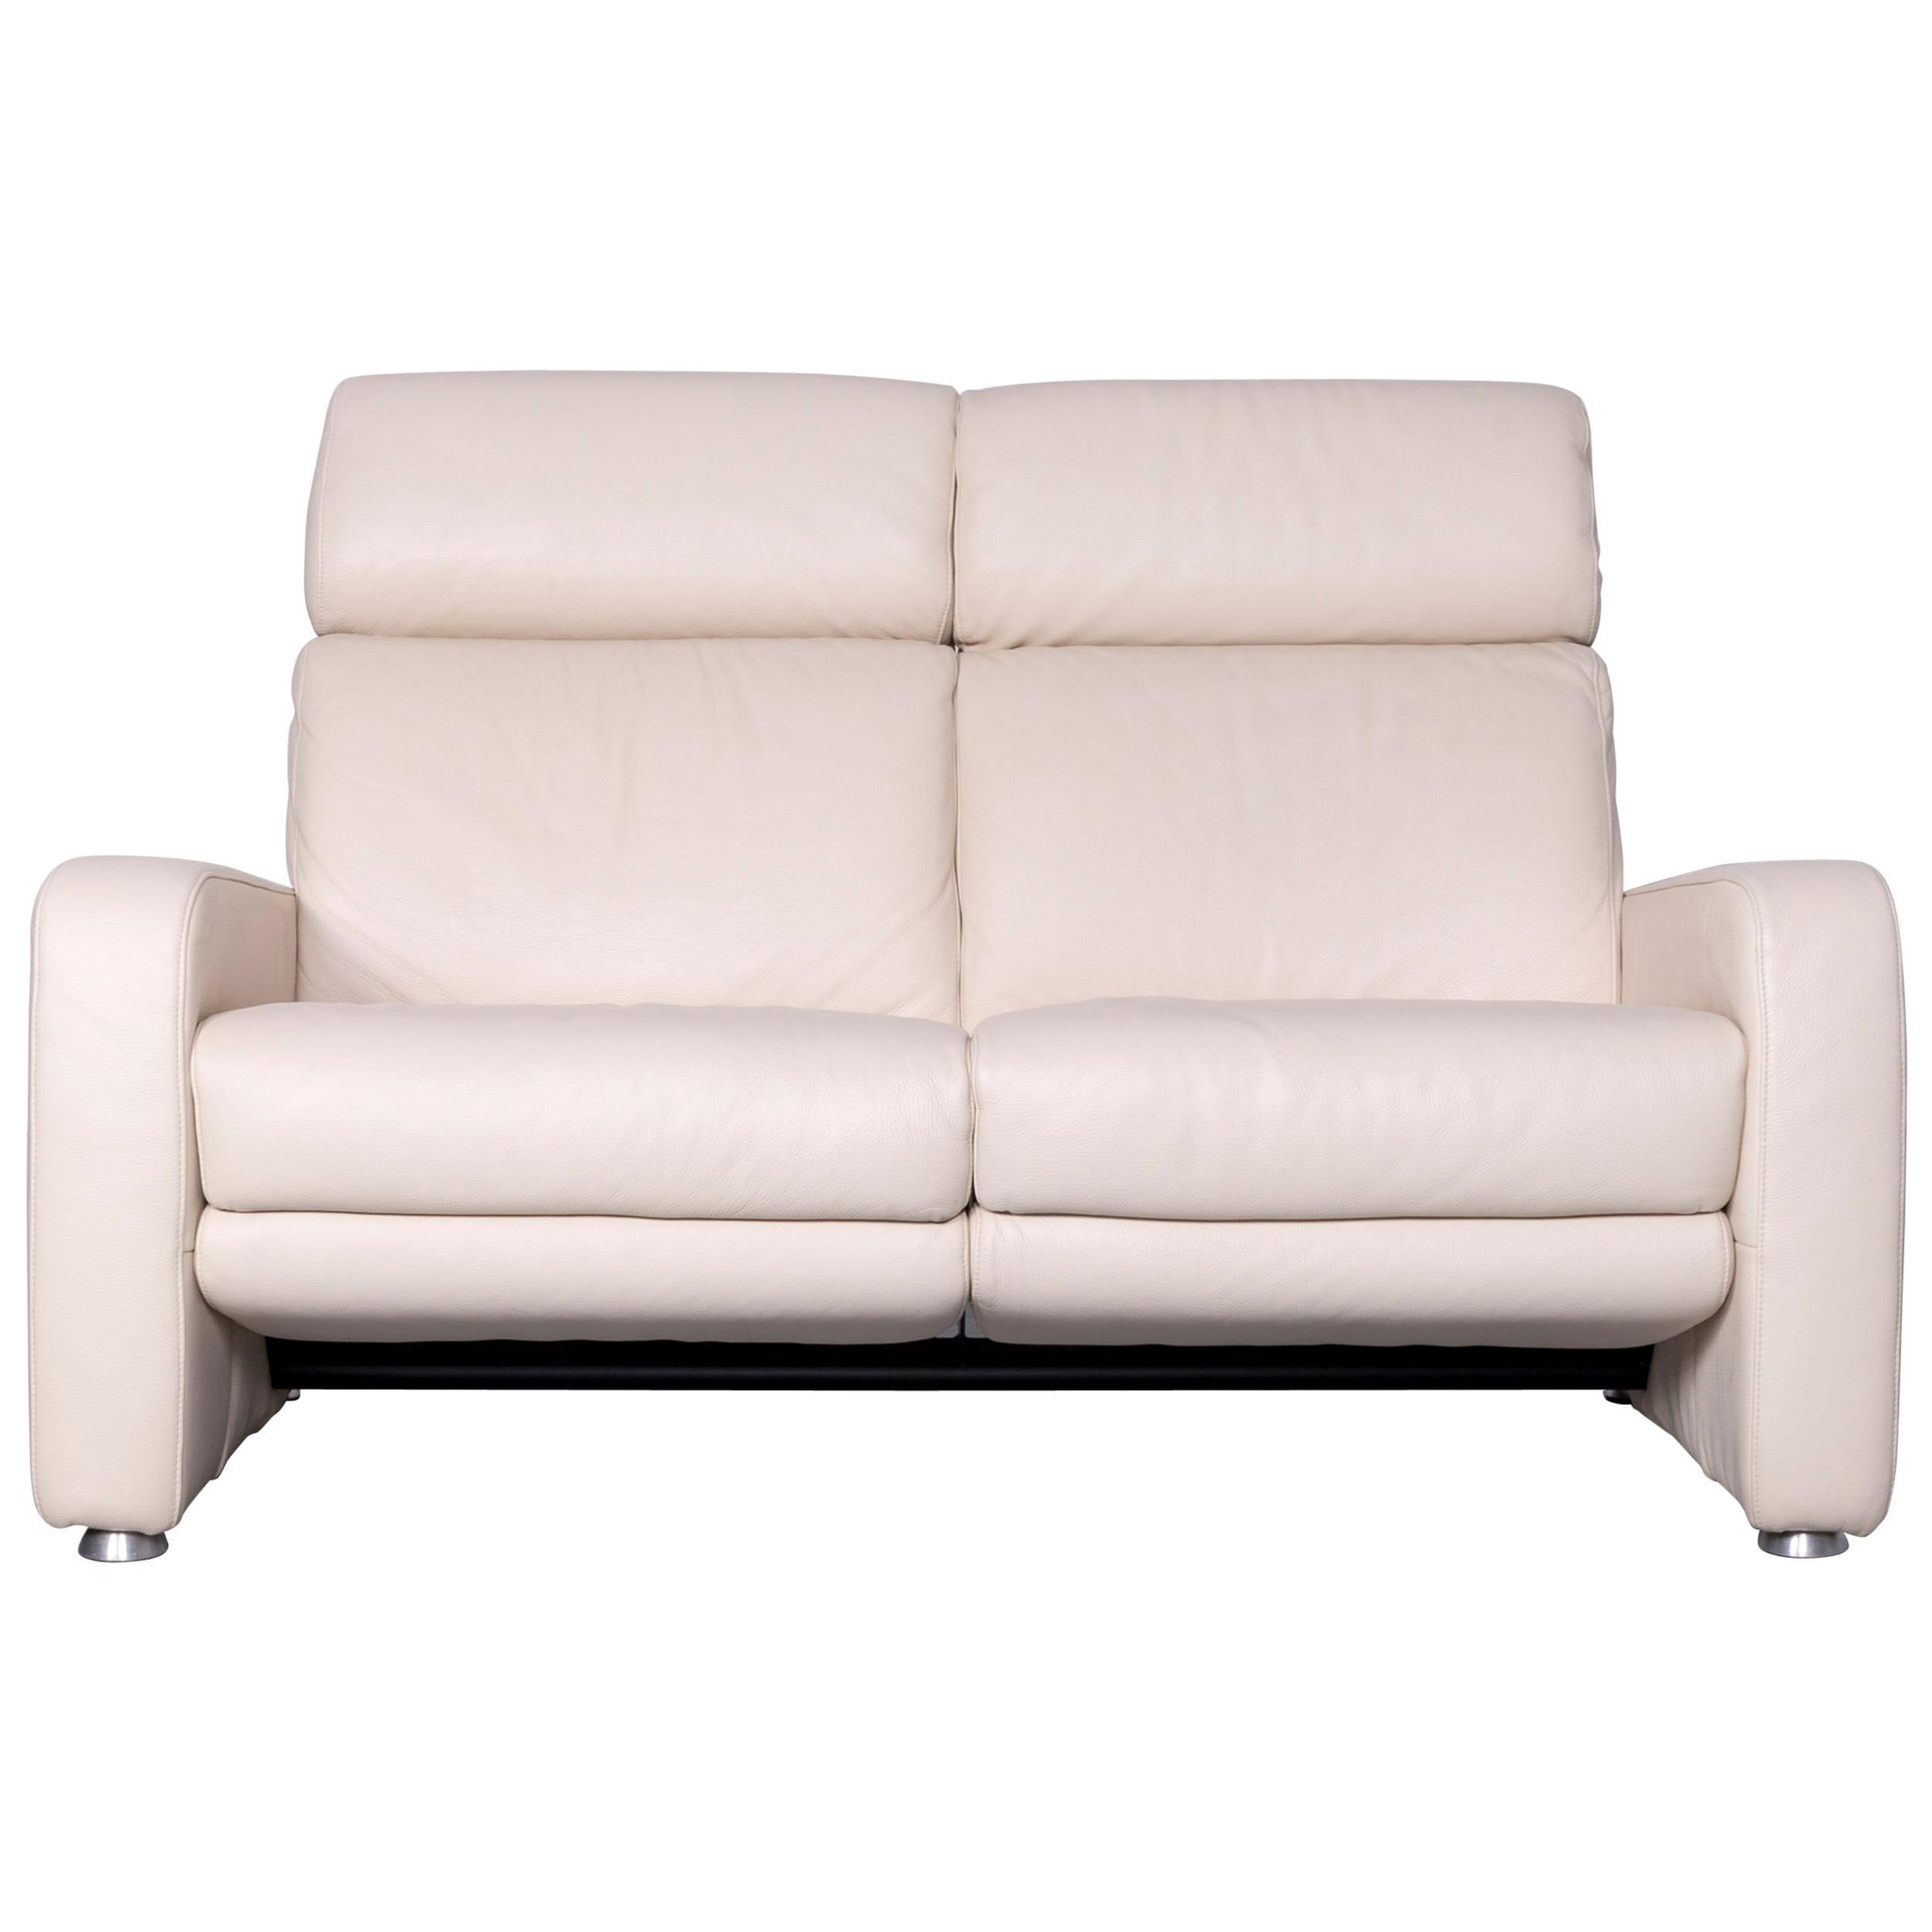 Willi Schillig Designer Leather Sofa Beige Two Seat Couch Recliner